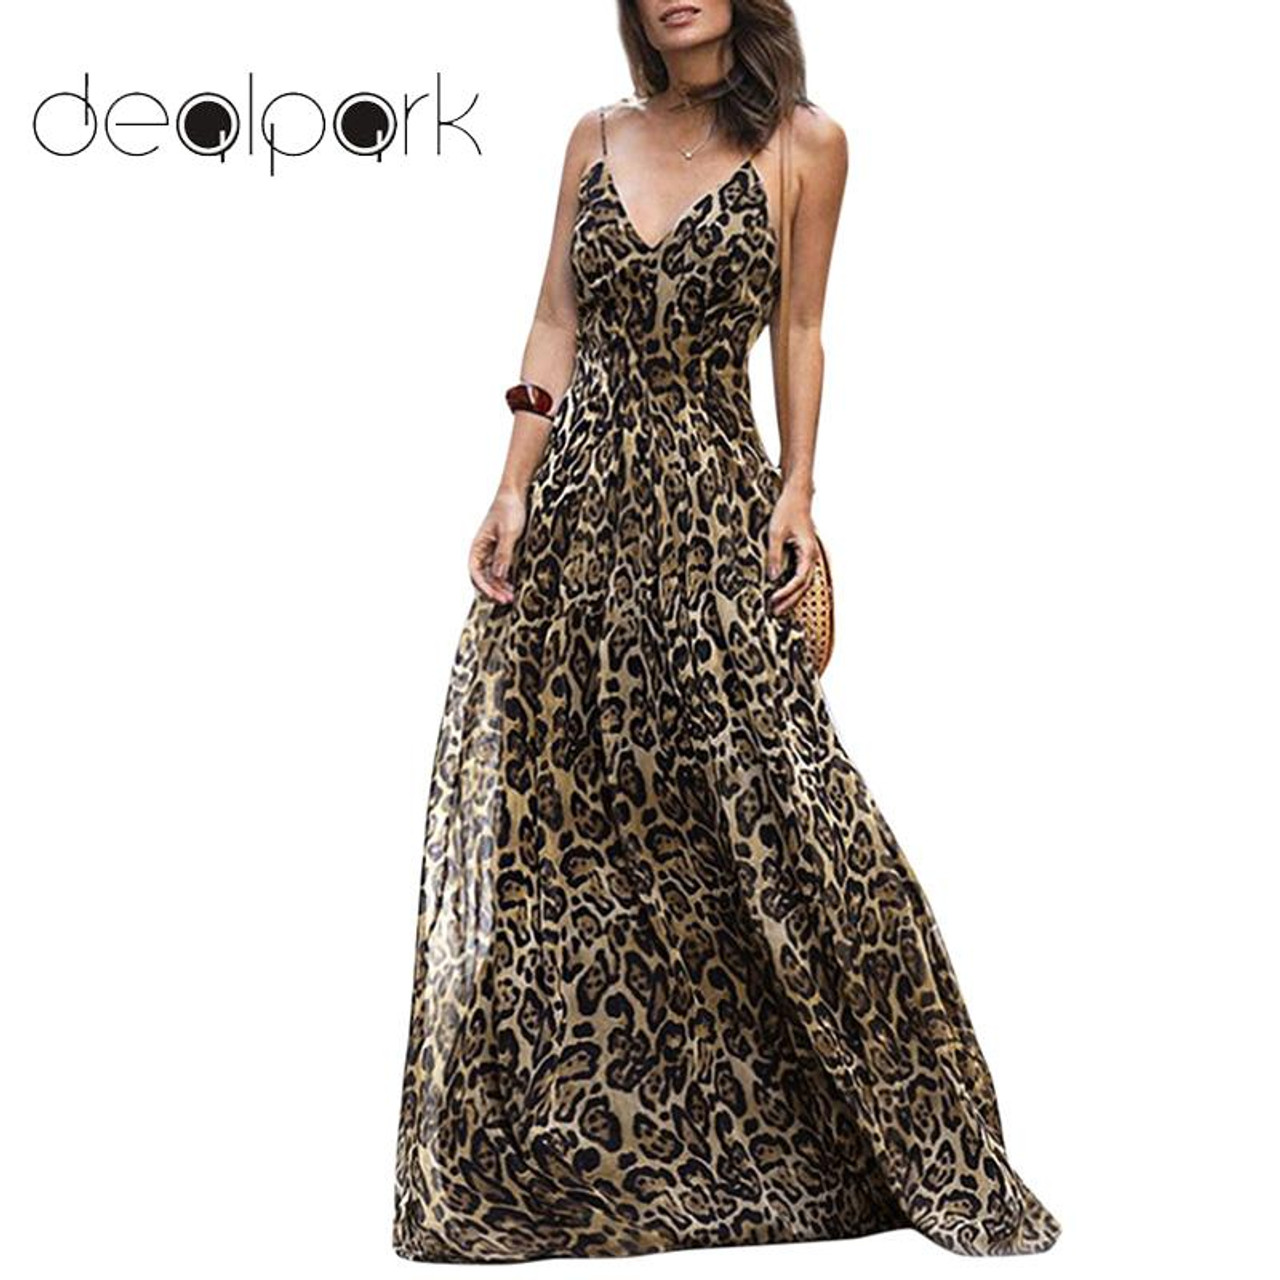 reliable quality shop for luxury good service HOT Beach Summer Dress 2019 Leopard V Neck Strap Maxi Dress Women Elegant  Sleeveless Clothing Floor-Length Ladies Dresses female